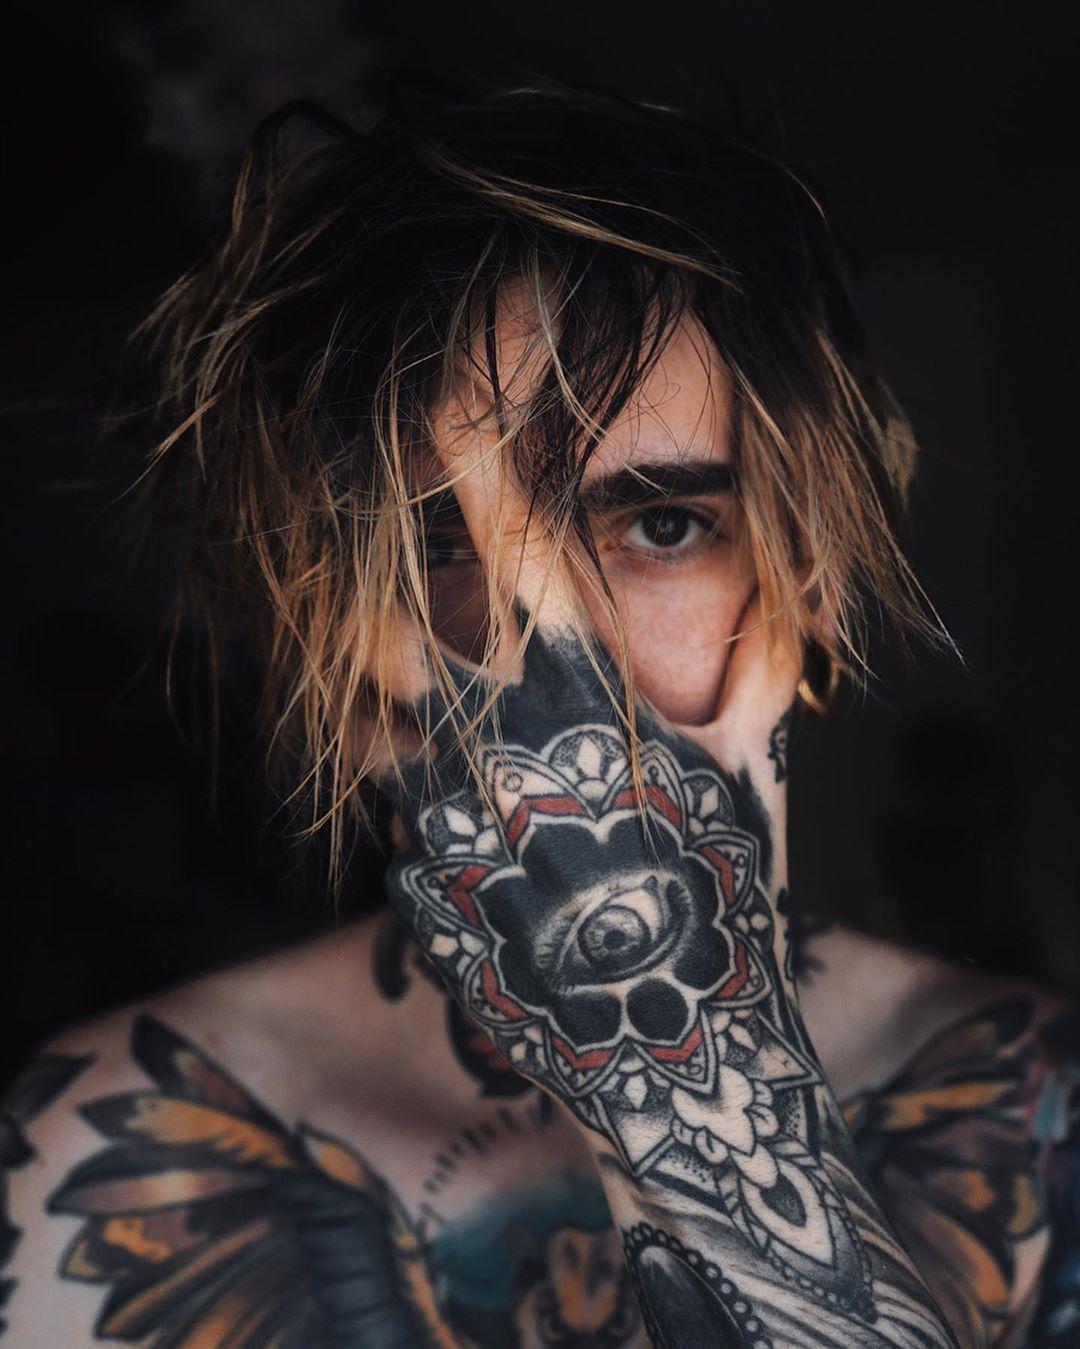 Or Tattoo Inkedup Tattoos Inked Ink Tattooed Tattooartist Tattooart Inkedup Tatto Tattoo Photoshoot Men Hair Color Tattoo Photography Tattoo boy wallpaper hd